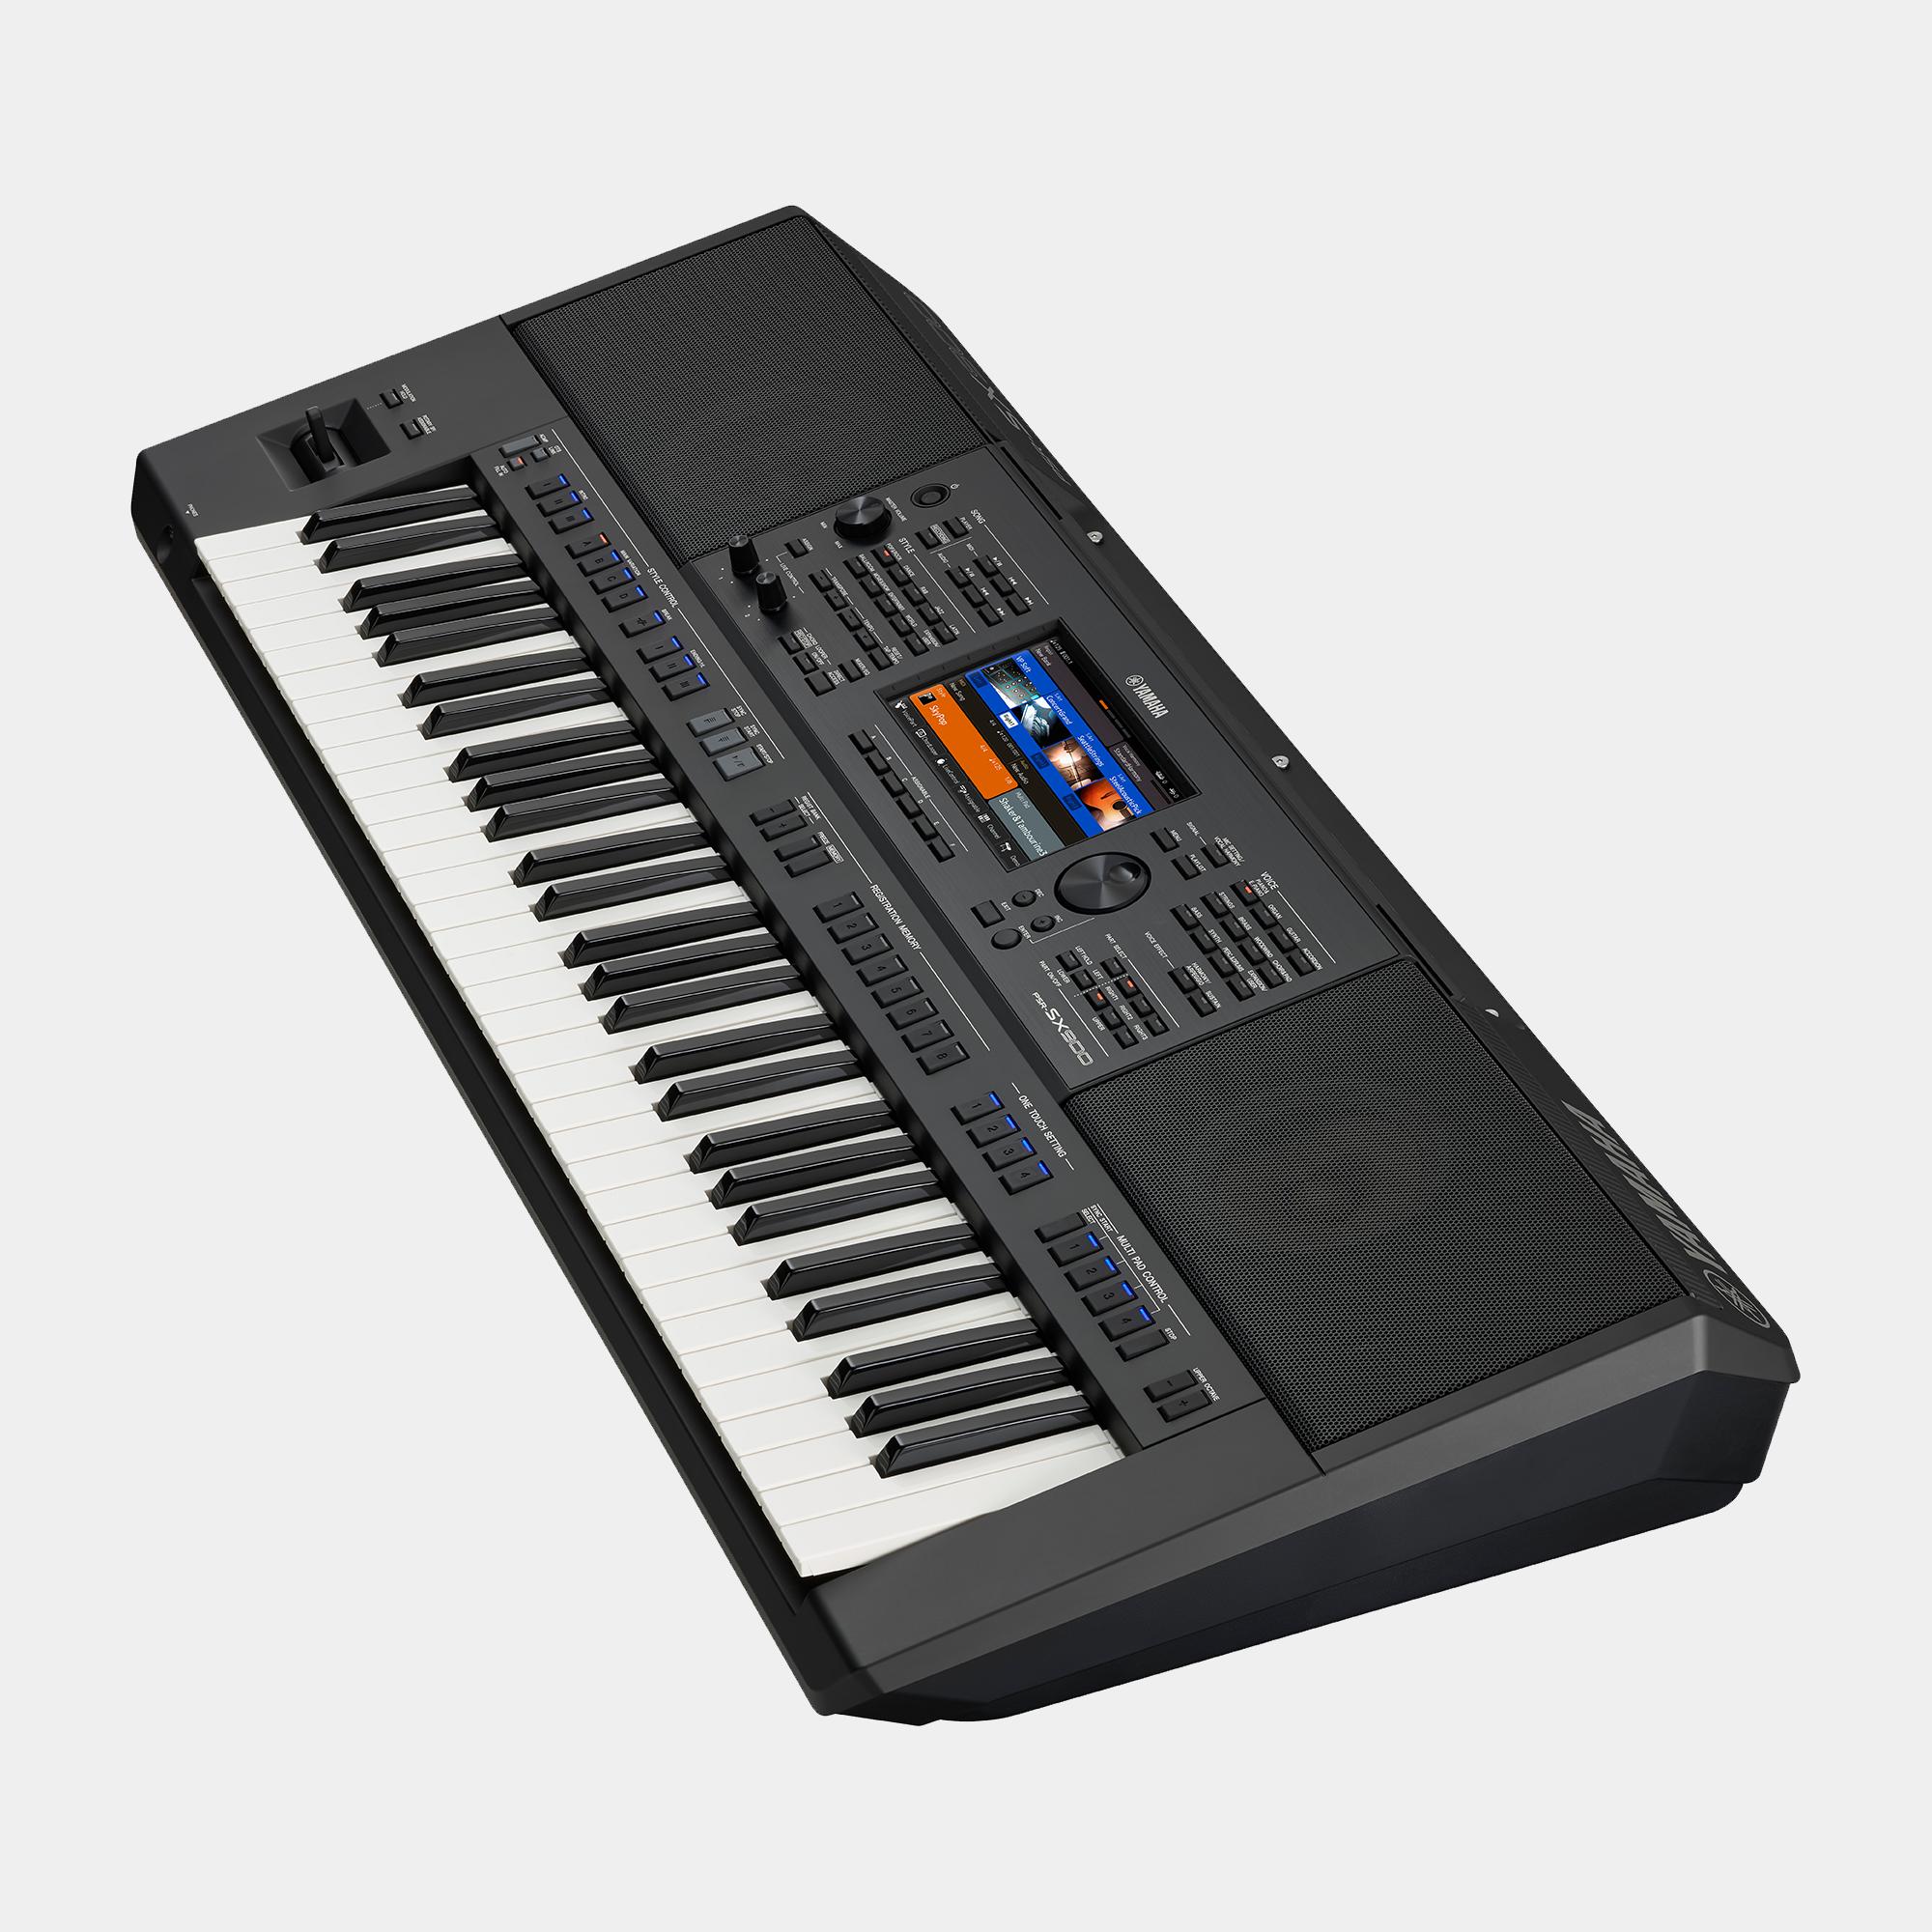 Đàn organ Yamaha PSR-SX900